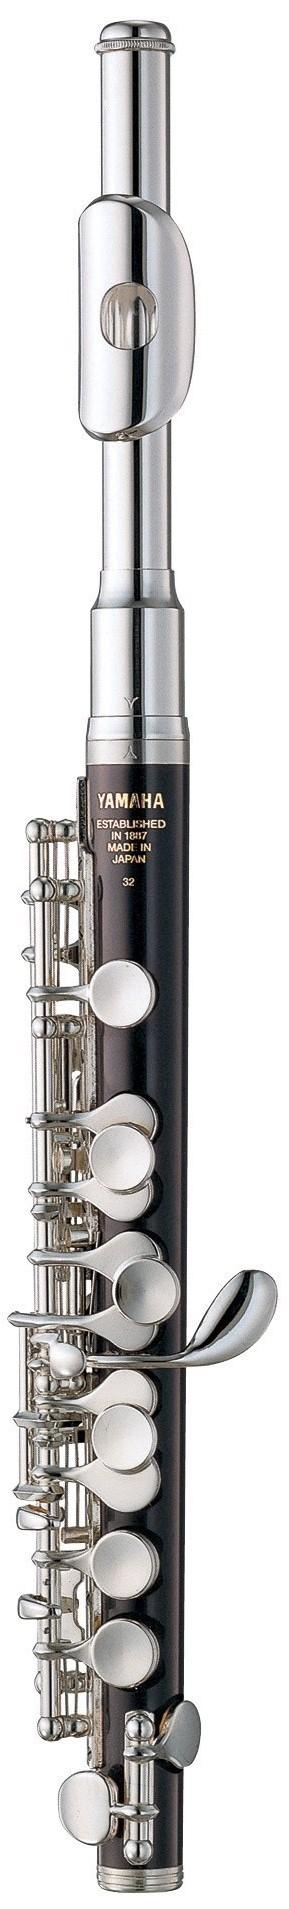 Yamaha - YPC - 32 - MK-G - Holzblasinstrumente - Piccolo-Flöten | MUSIK BERTRAM Deutschland Freiburg